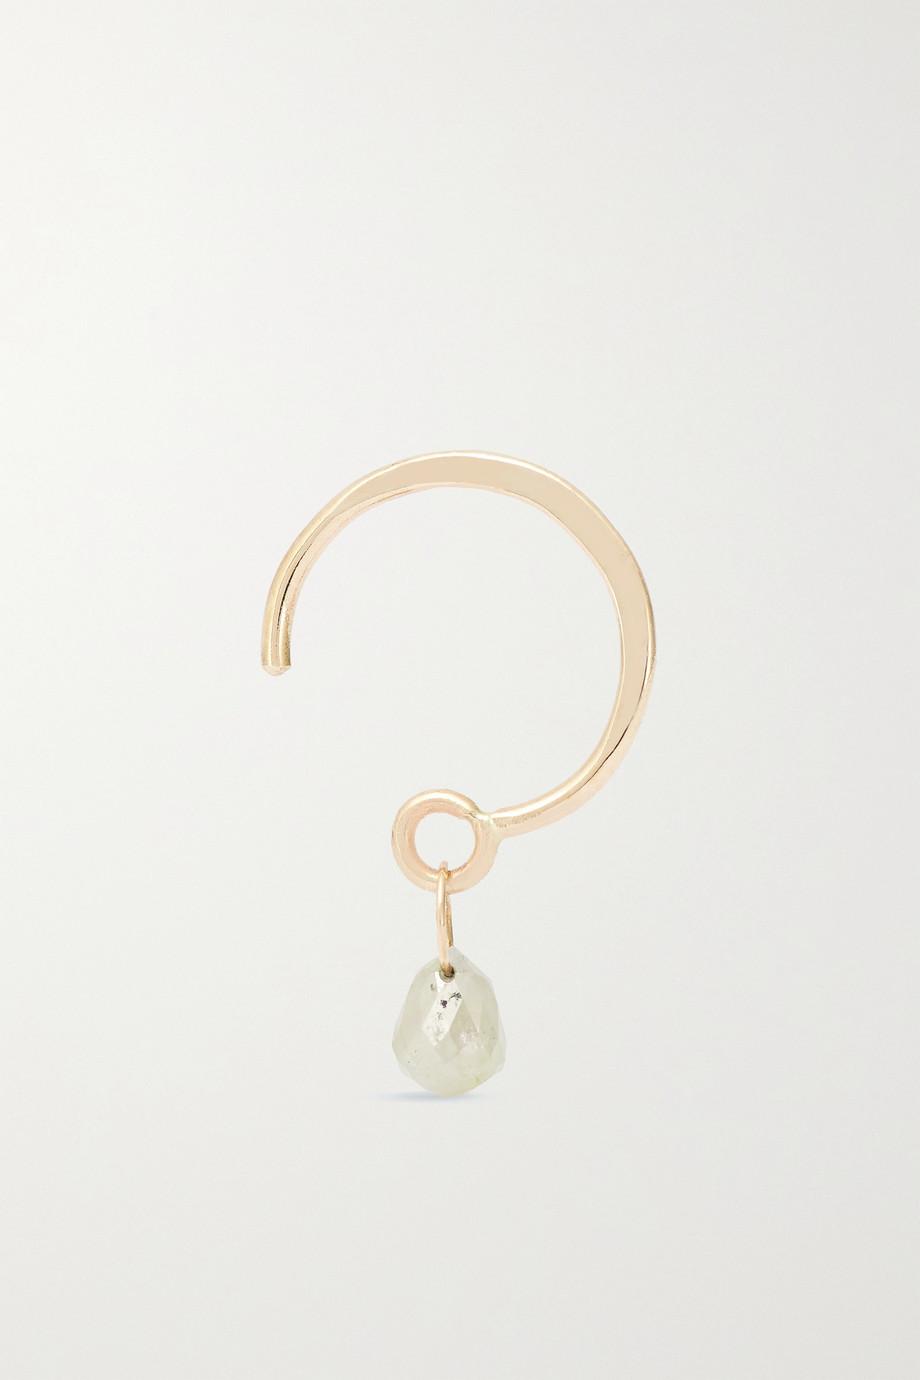 Melissa Joy Manning 14-karat gold diamond earring